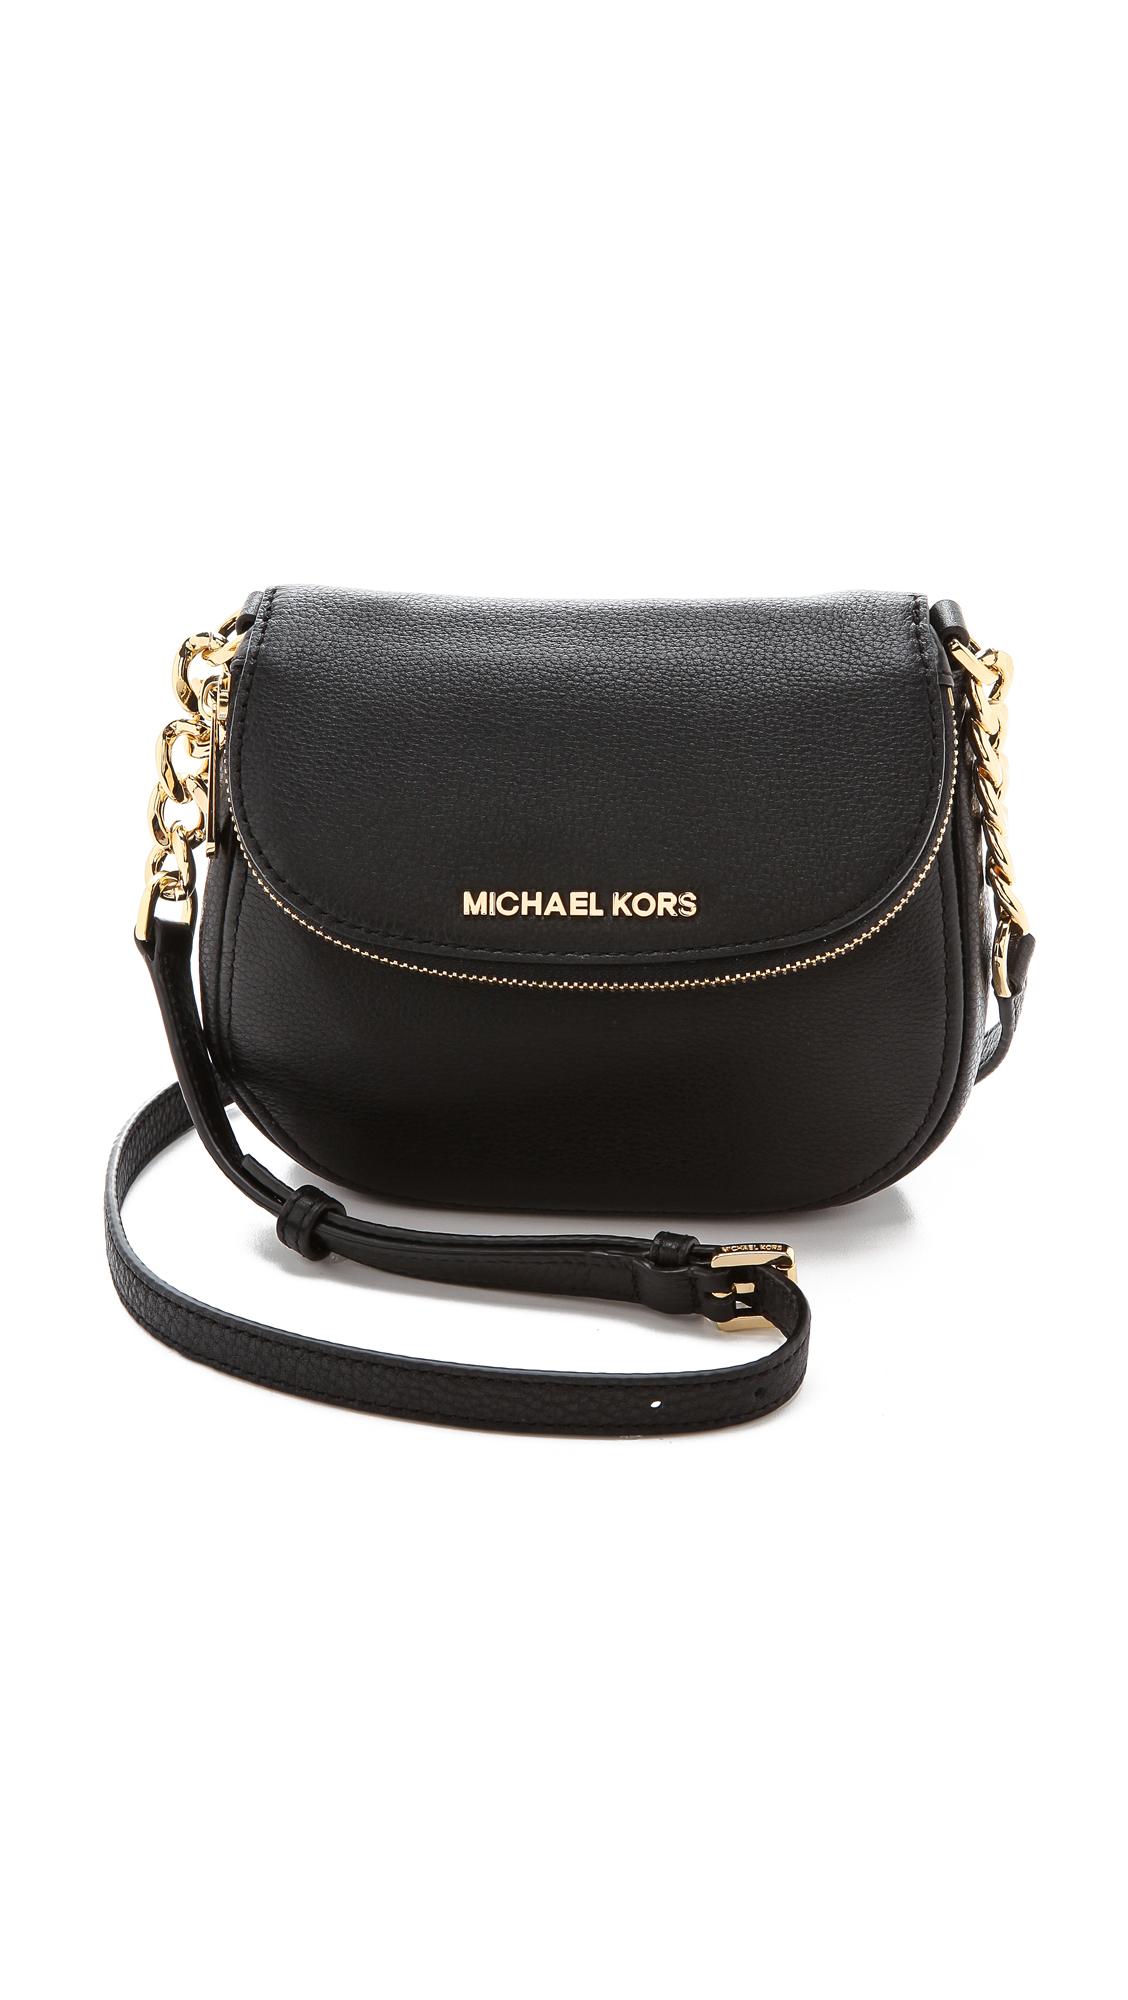 584c54f43fb9 MICHAEL Michael Kors Bedford Flap Cross Body Bag Luggage in Black - Lyst